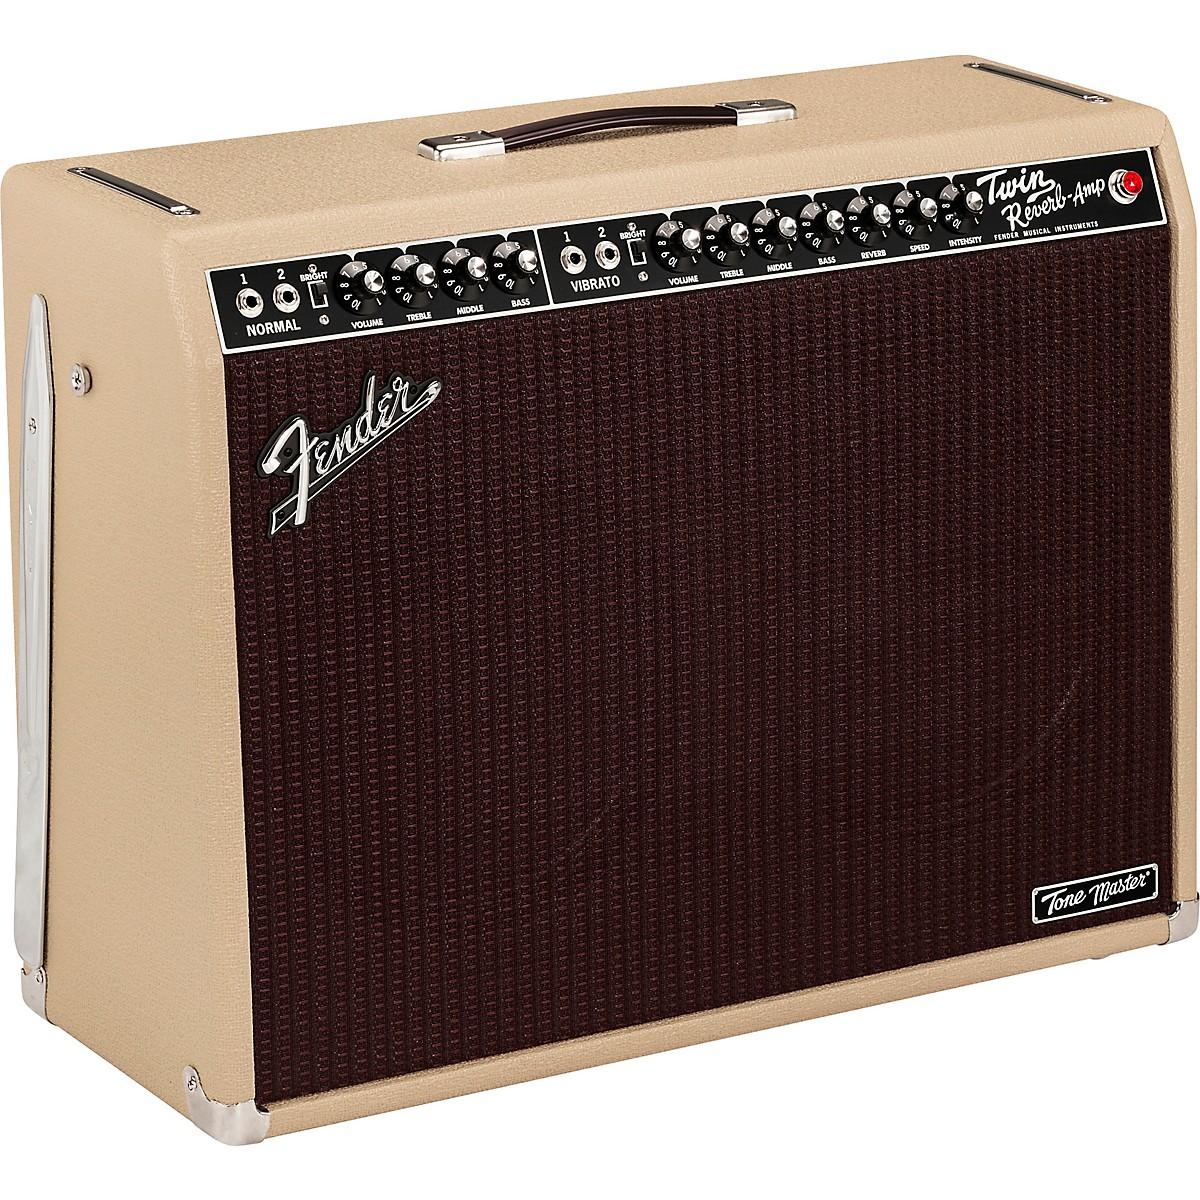 Fender Tone Master Twin Reverb 100W 1x12 Celestion NEO Creamback